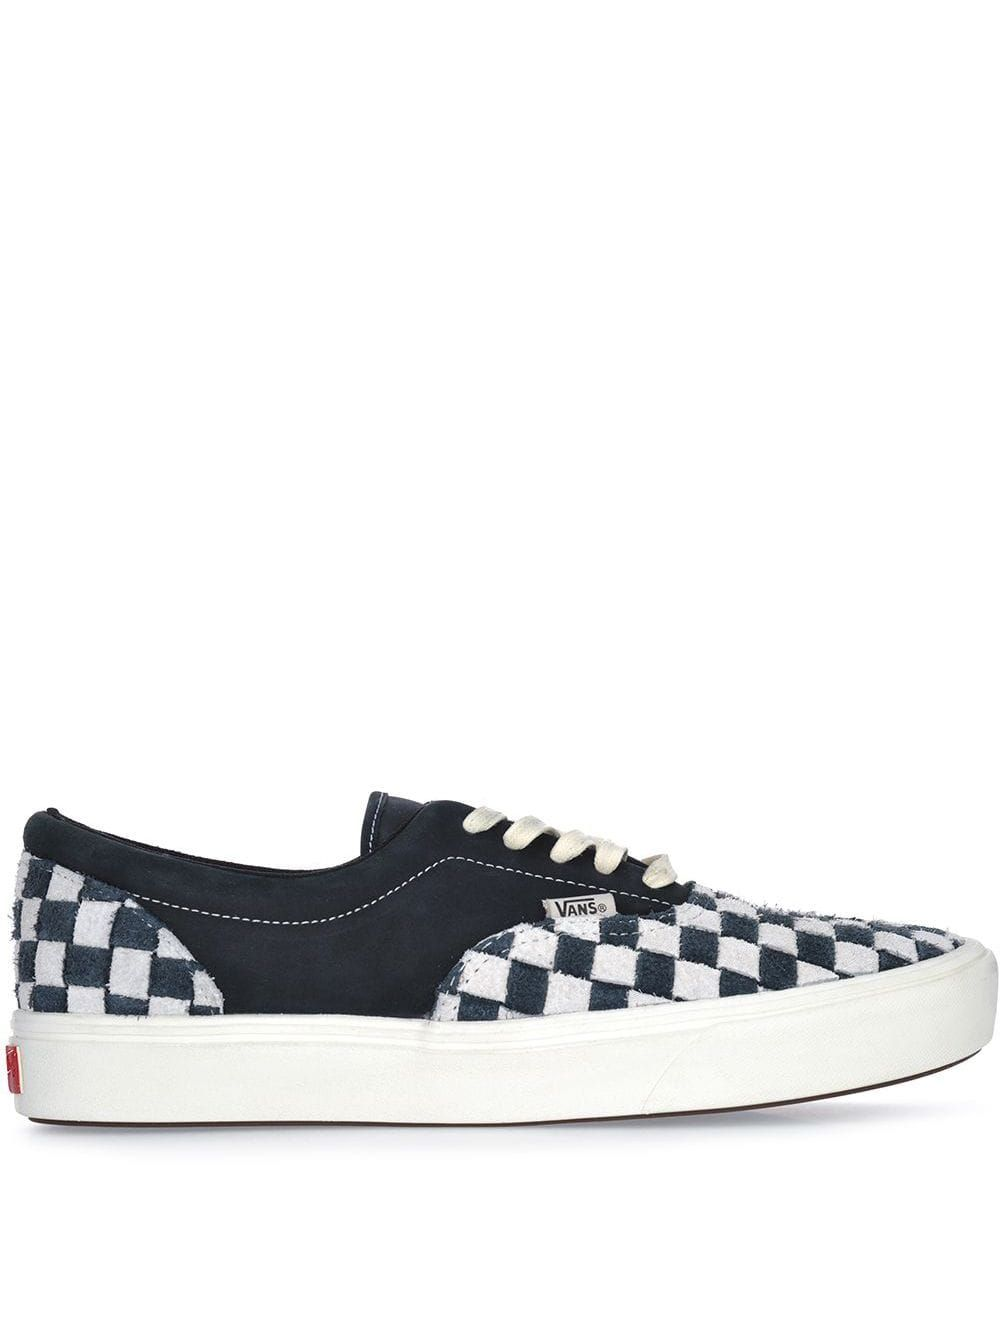 Vans checkered low tops Blue | Vans checkered, Vans shop